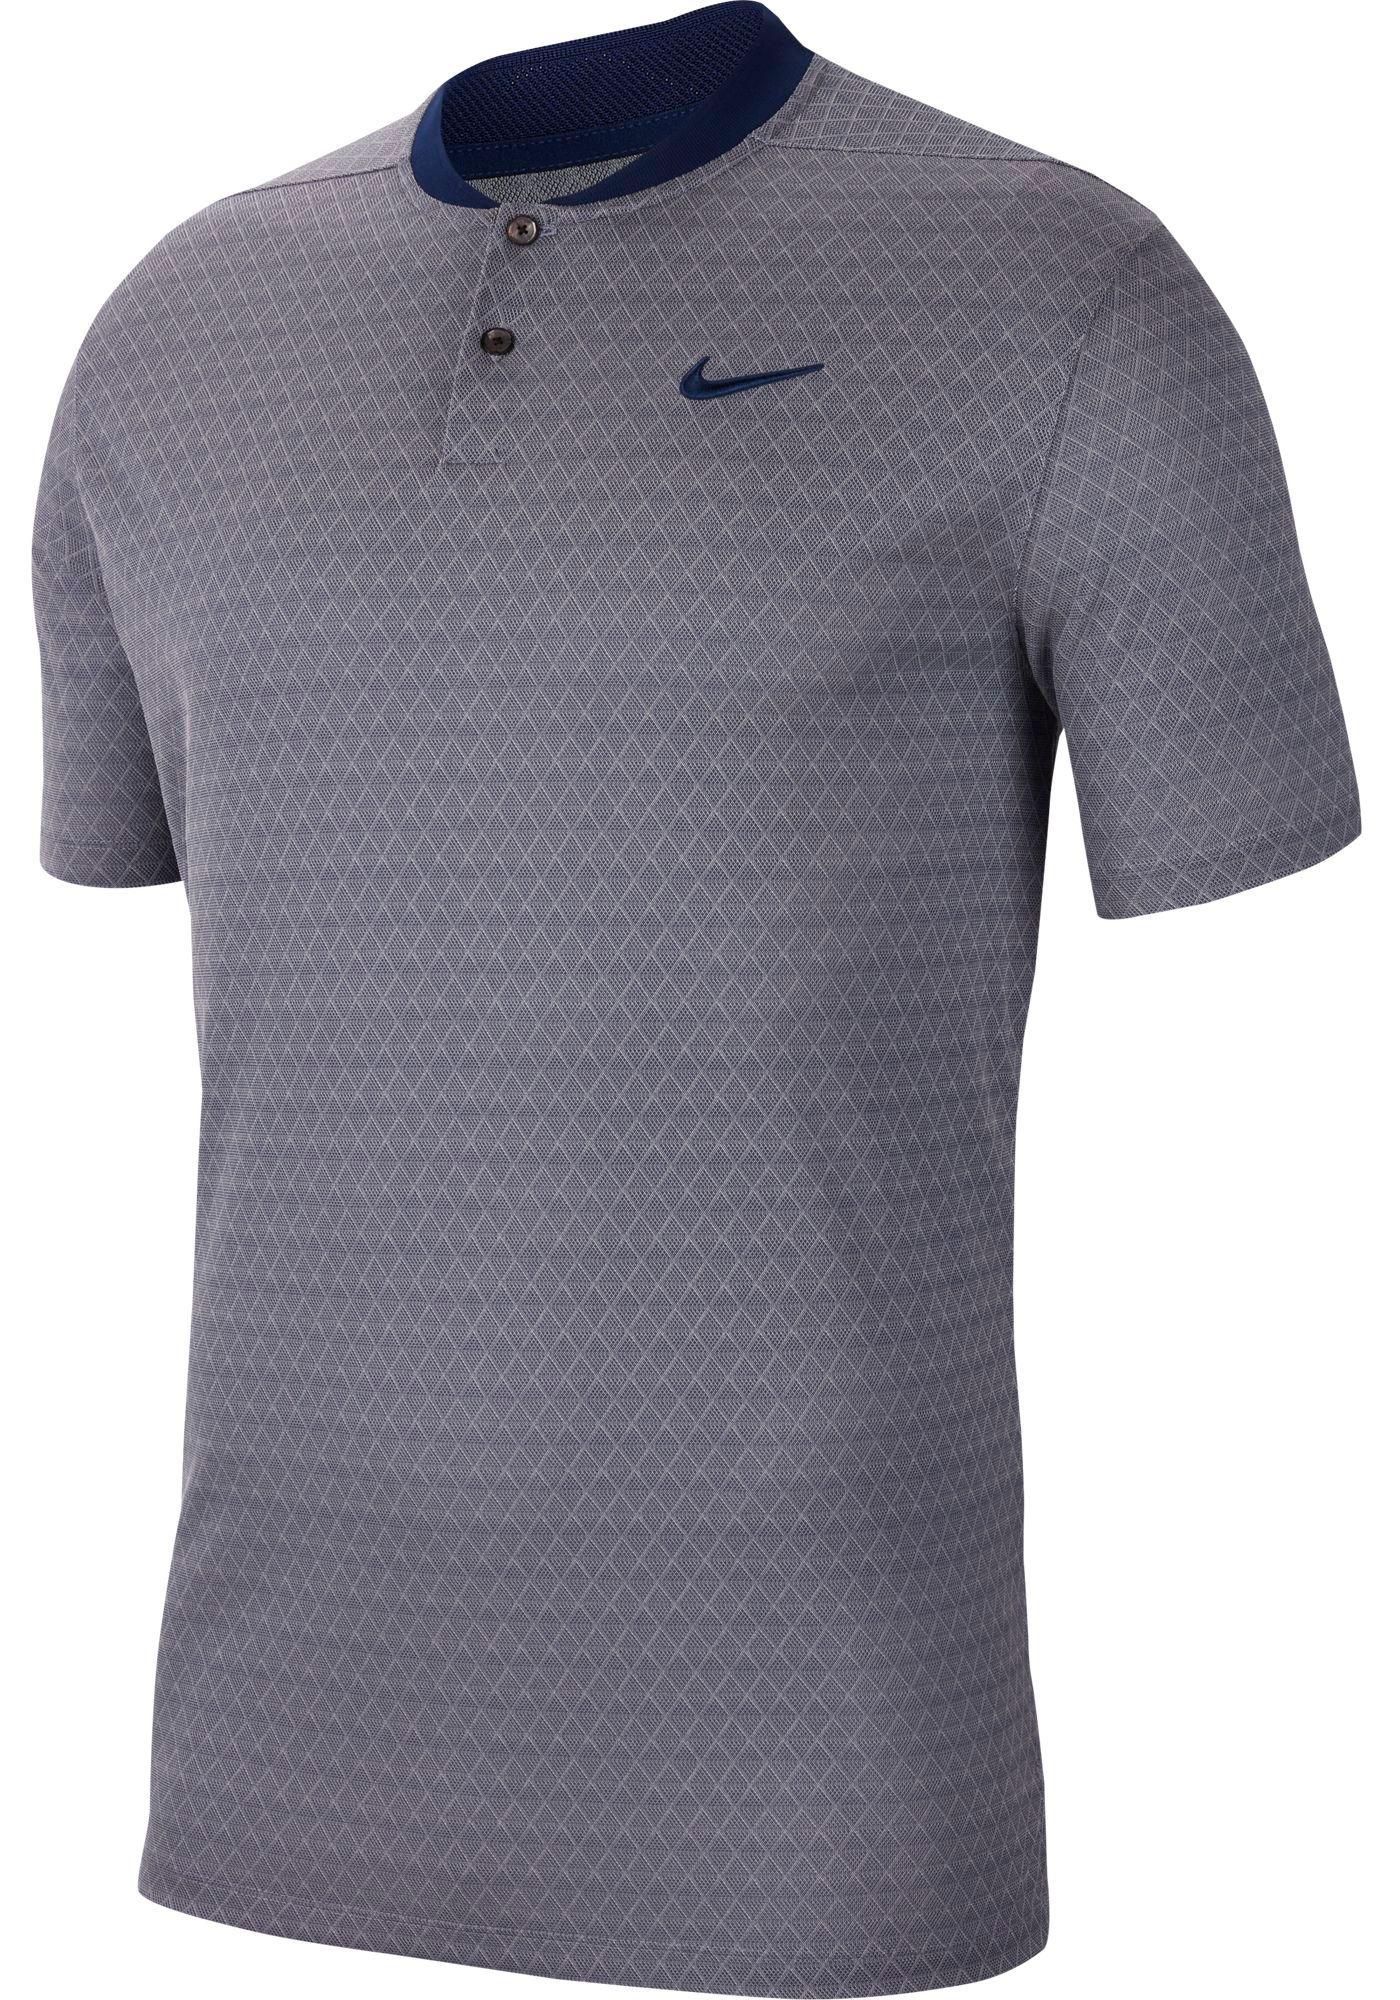 Nike Men's Dri-FIT Vapor Blade Print Golf Polo